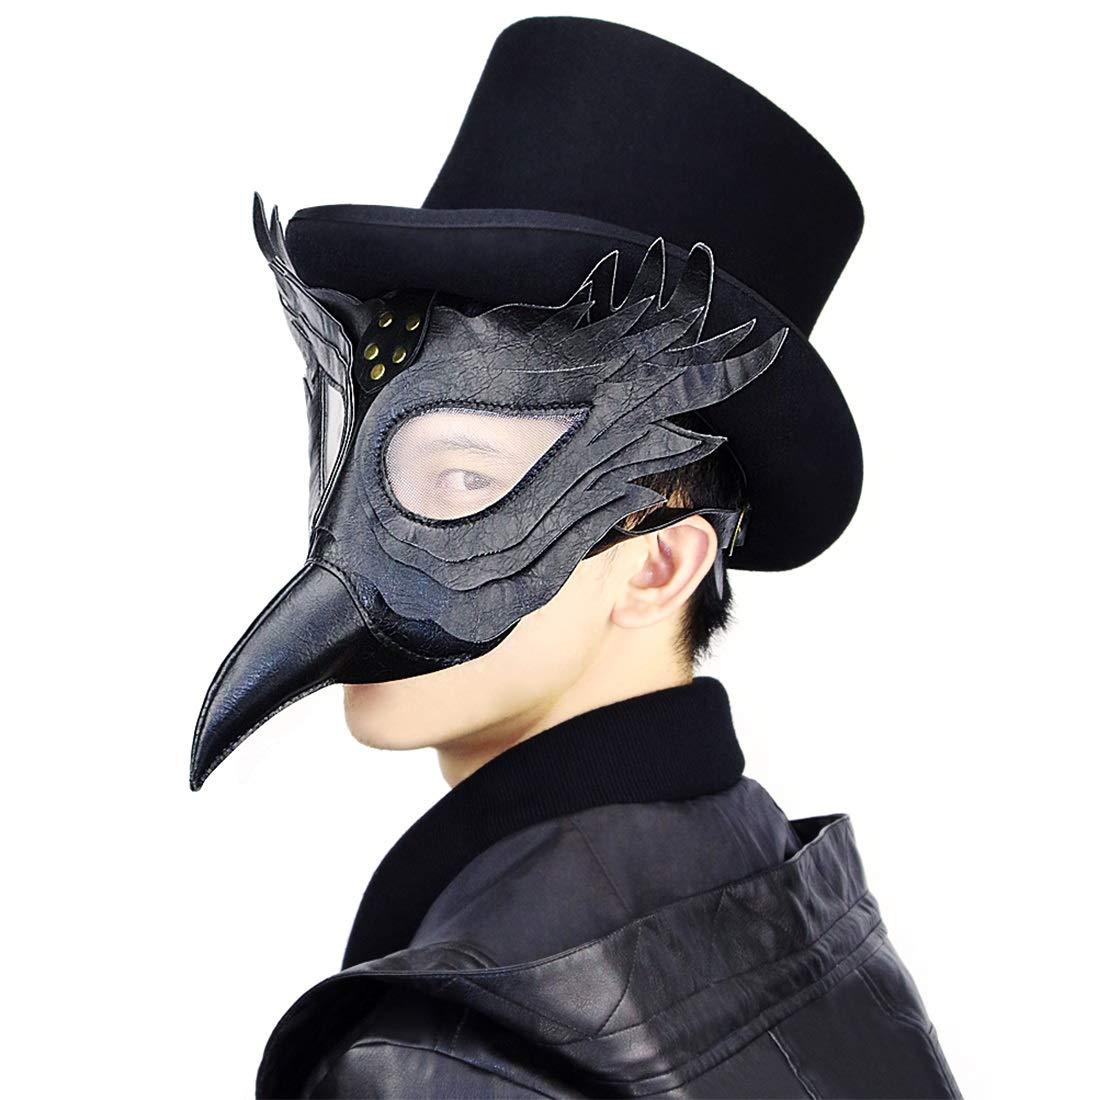 KERVINFENDRIYUN YY4 Leder Steampunk Steampunk Steampunk Pest Arzt Vogel Maske Kurze Nase Schnabel Faux Cosplay Halloween Weihnachten Kostüm Requisiten (Farbe : Style1) 32de1a